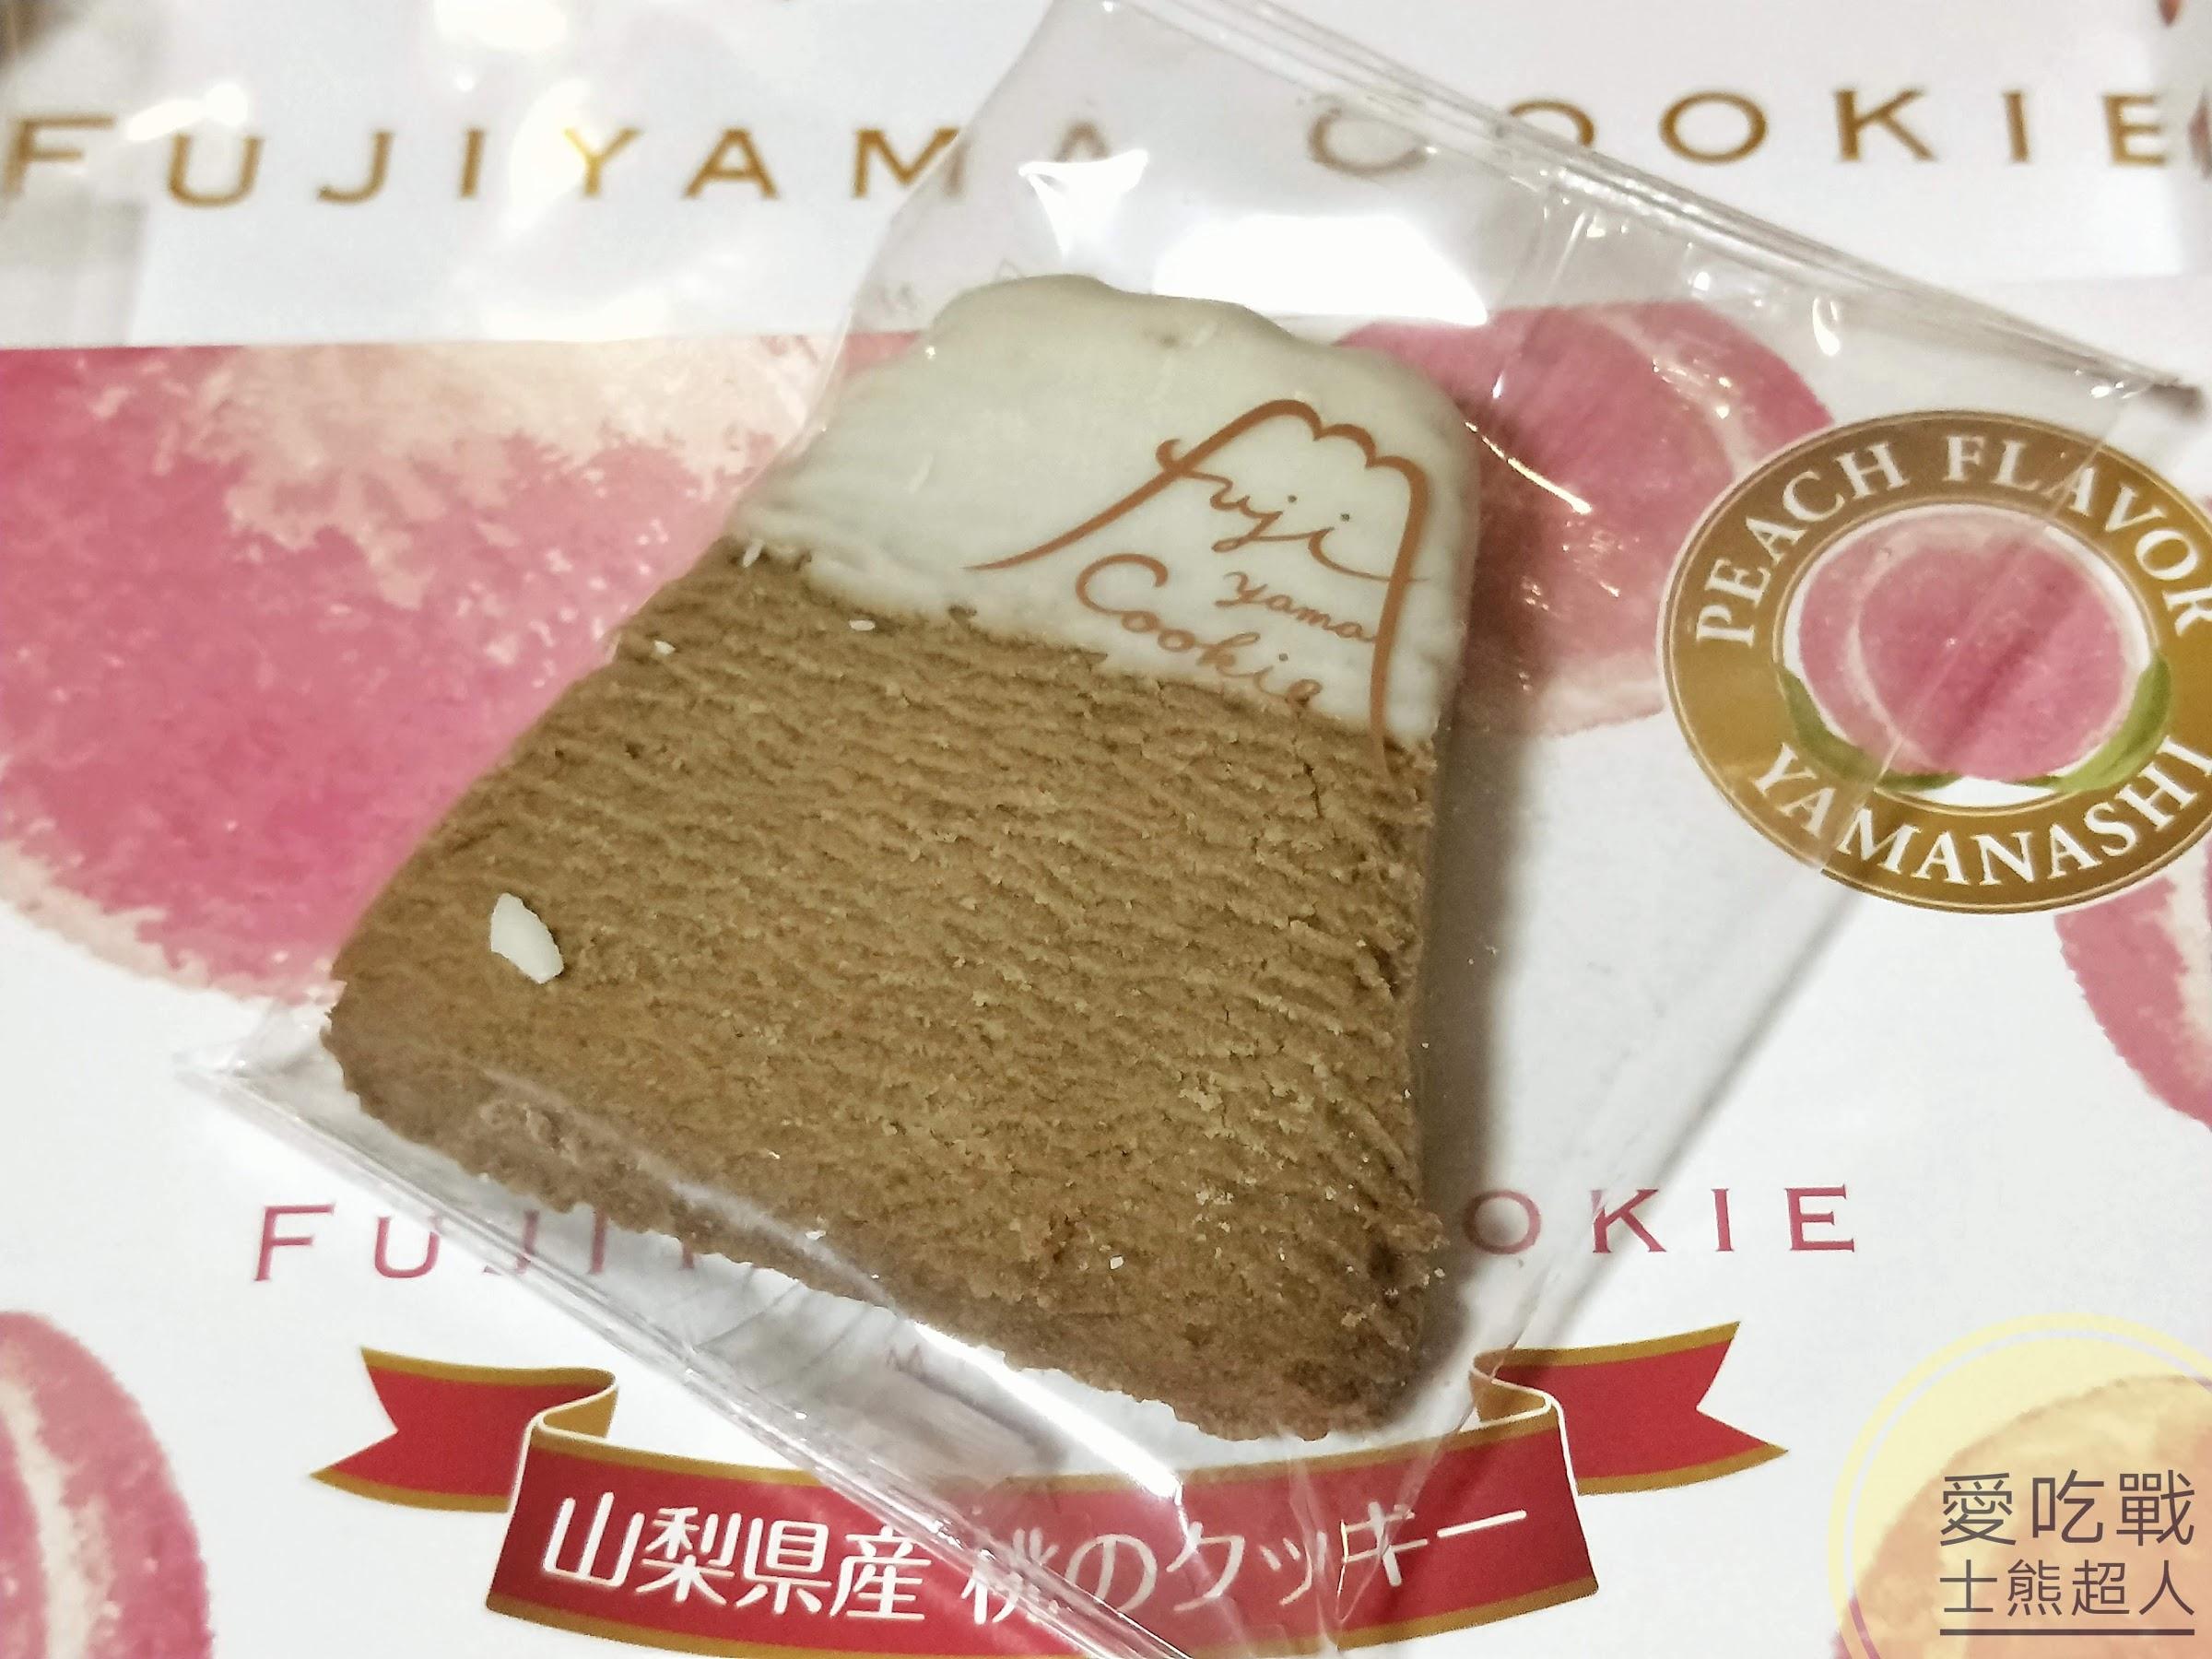 FUJIYAMA COOKIE 富士餅乾